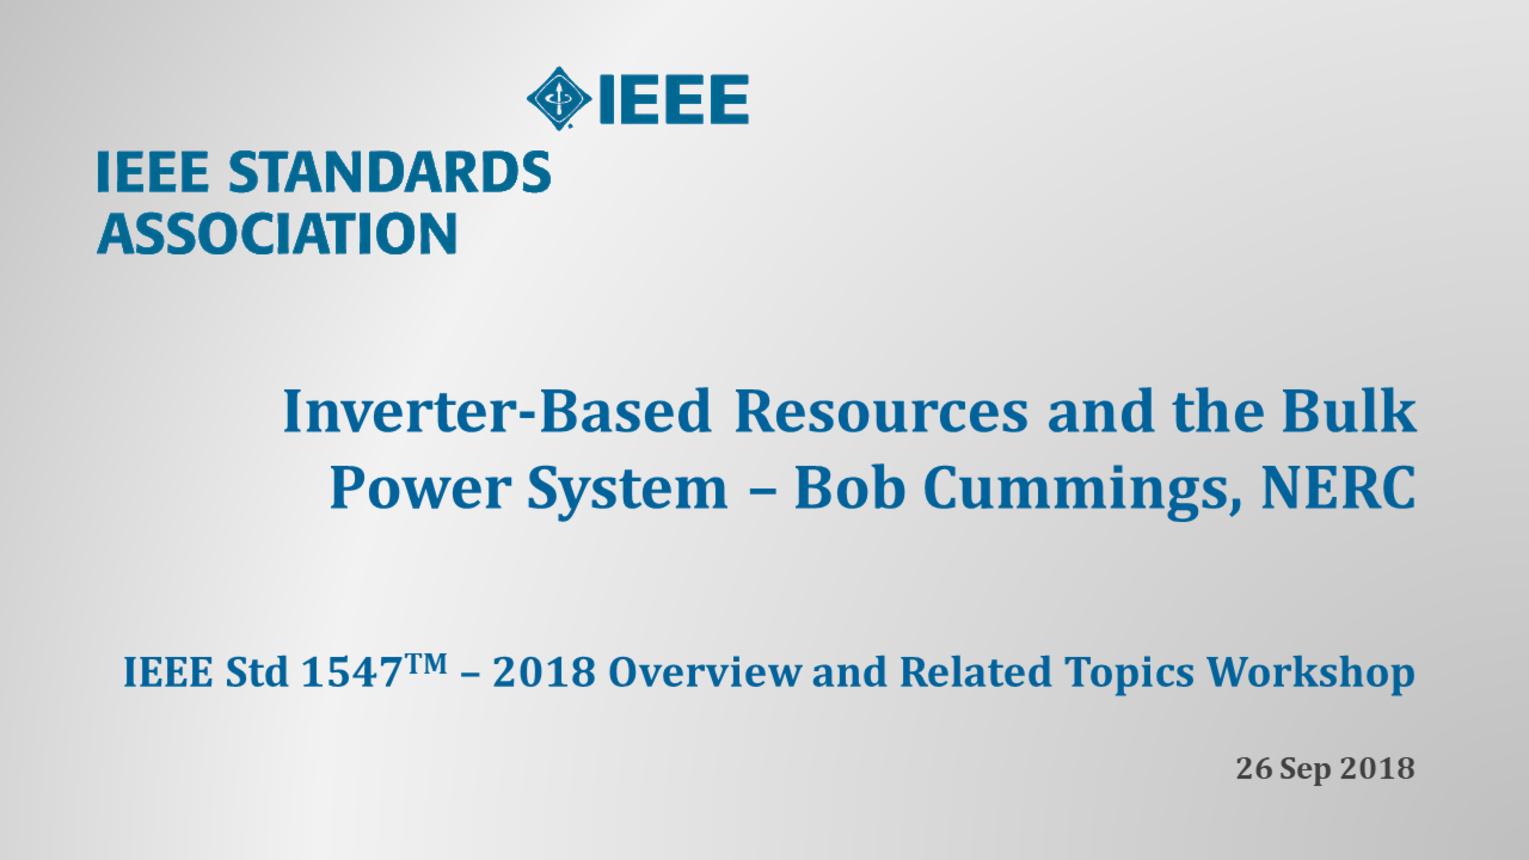 IEEE Std 1547 Workshop - NERC - Atlanta, GA - Sept. 2018: Inverter Systems and the BPS - Bob Cummings